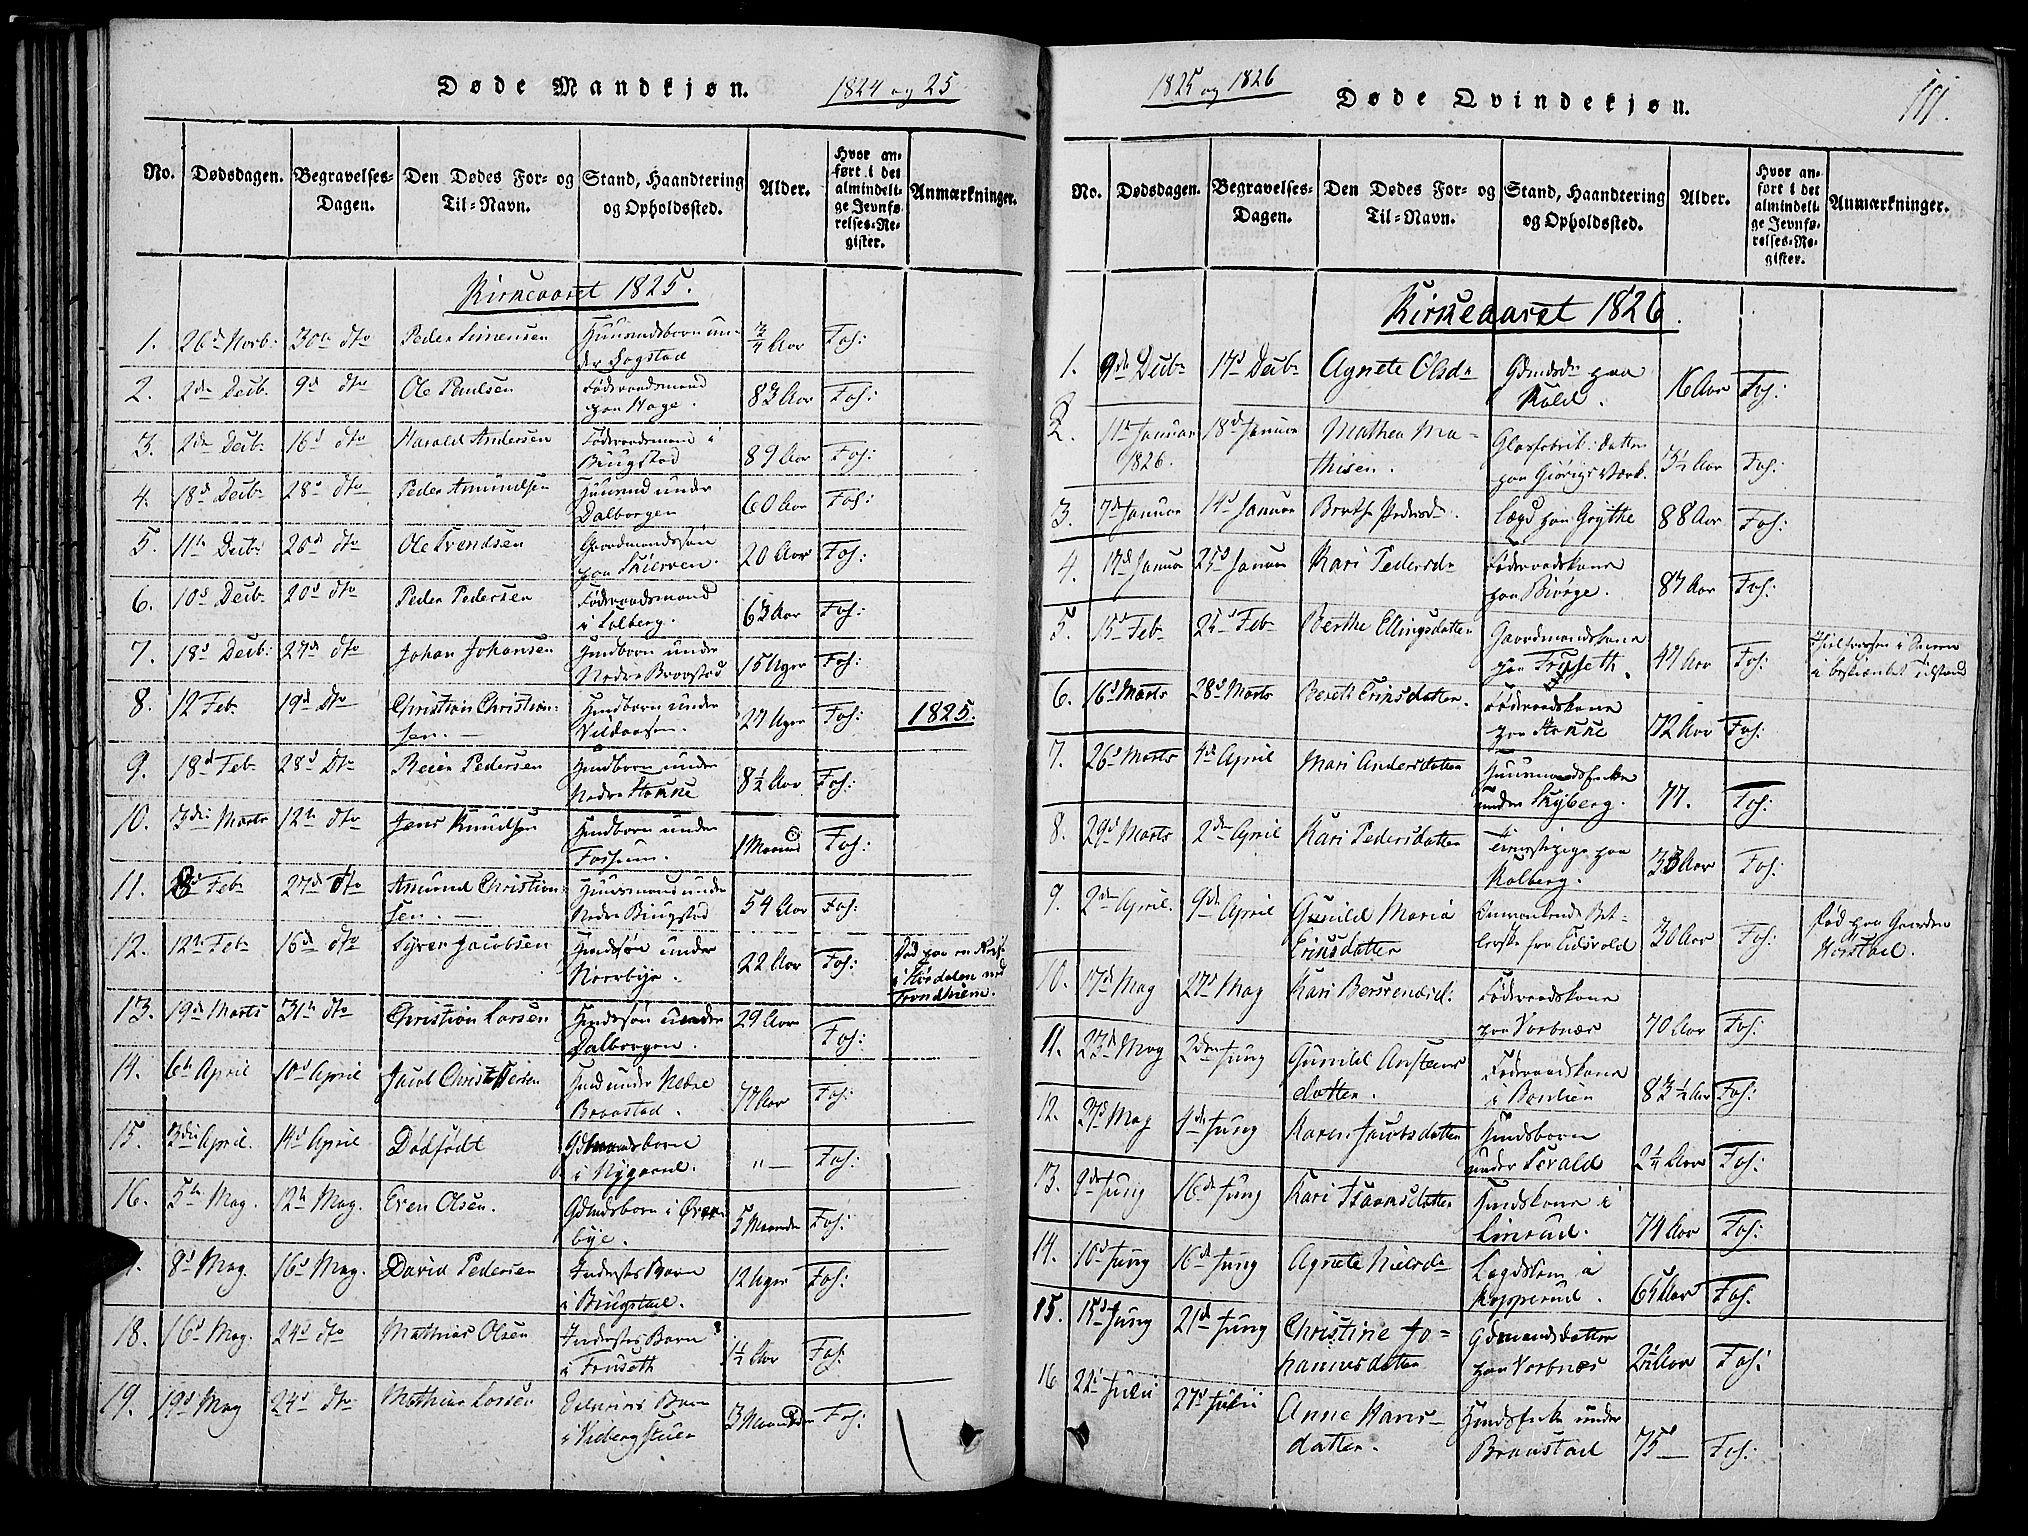 SAH, Vardal prestekontor, H/Ha/Haa/L0004: Ministerialbok nr. 4, 1814-1831, s. 111